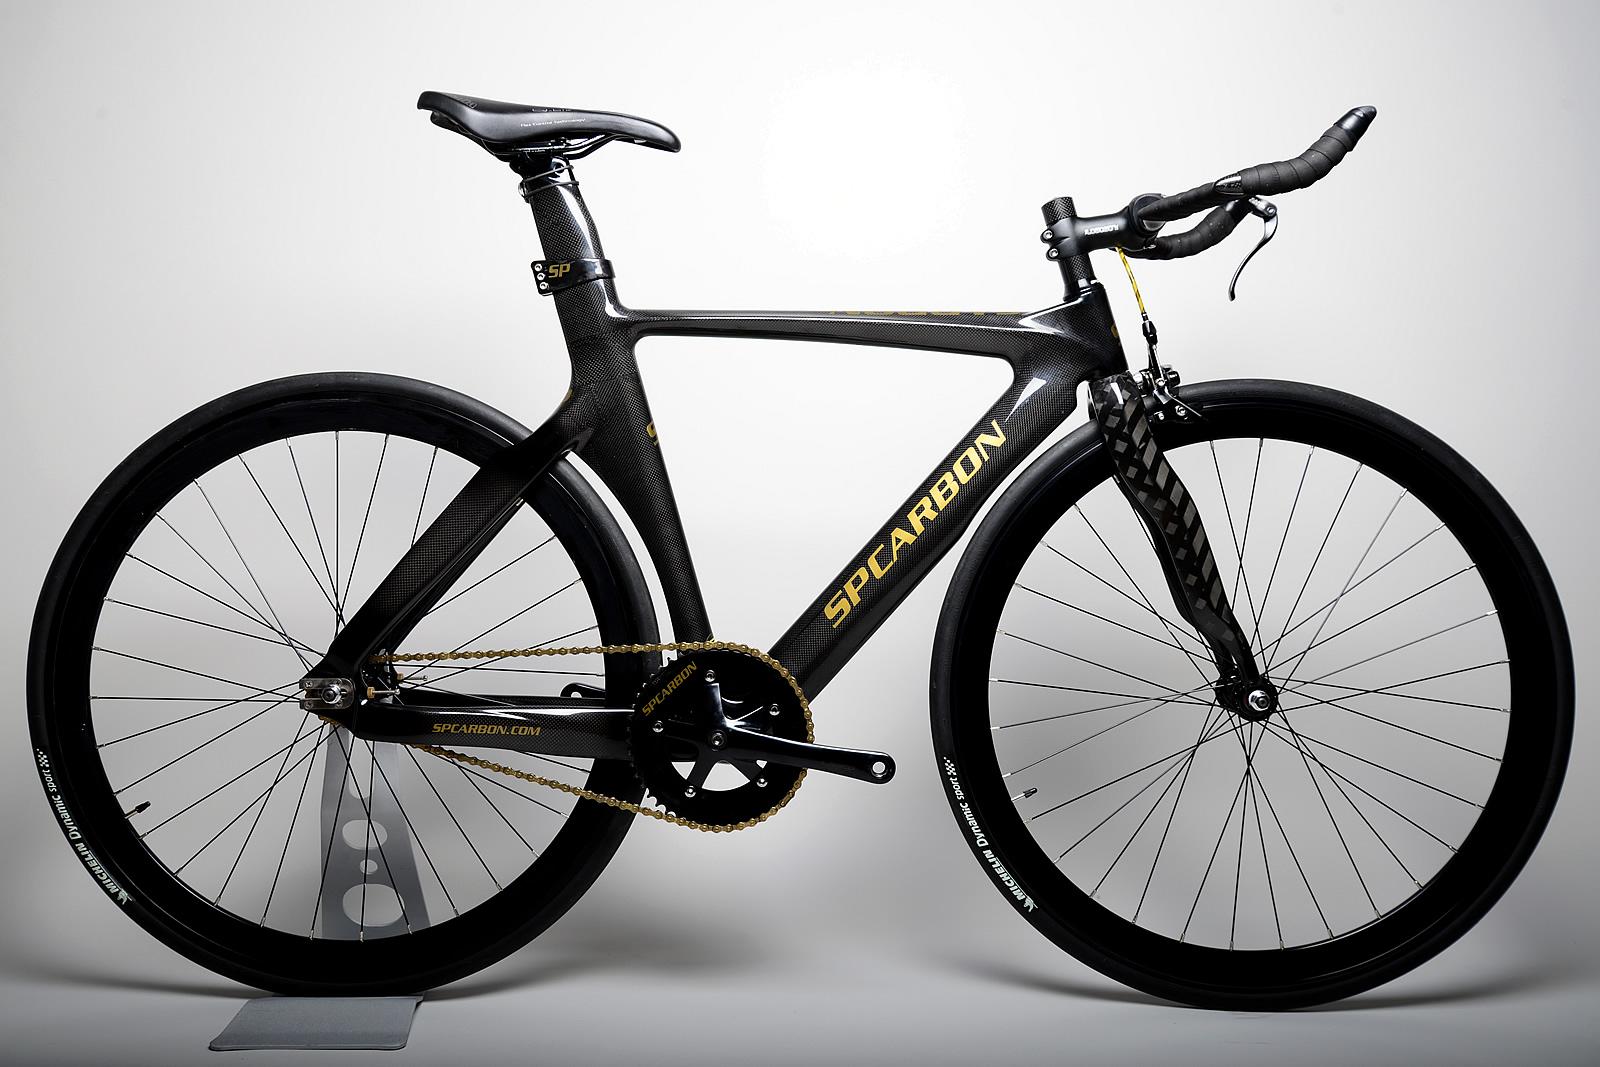 Argon 18 vs SP Carbon – BikeWar